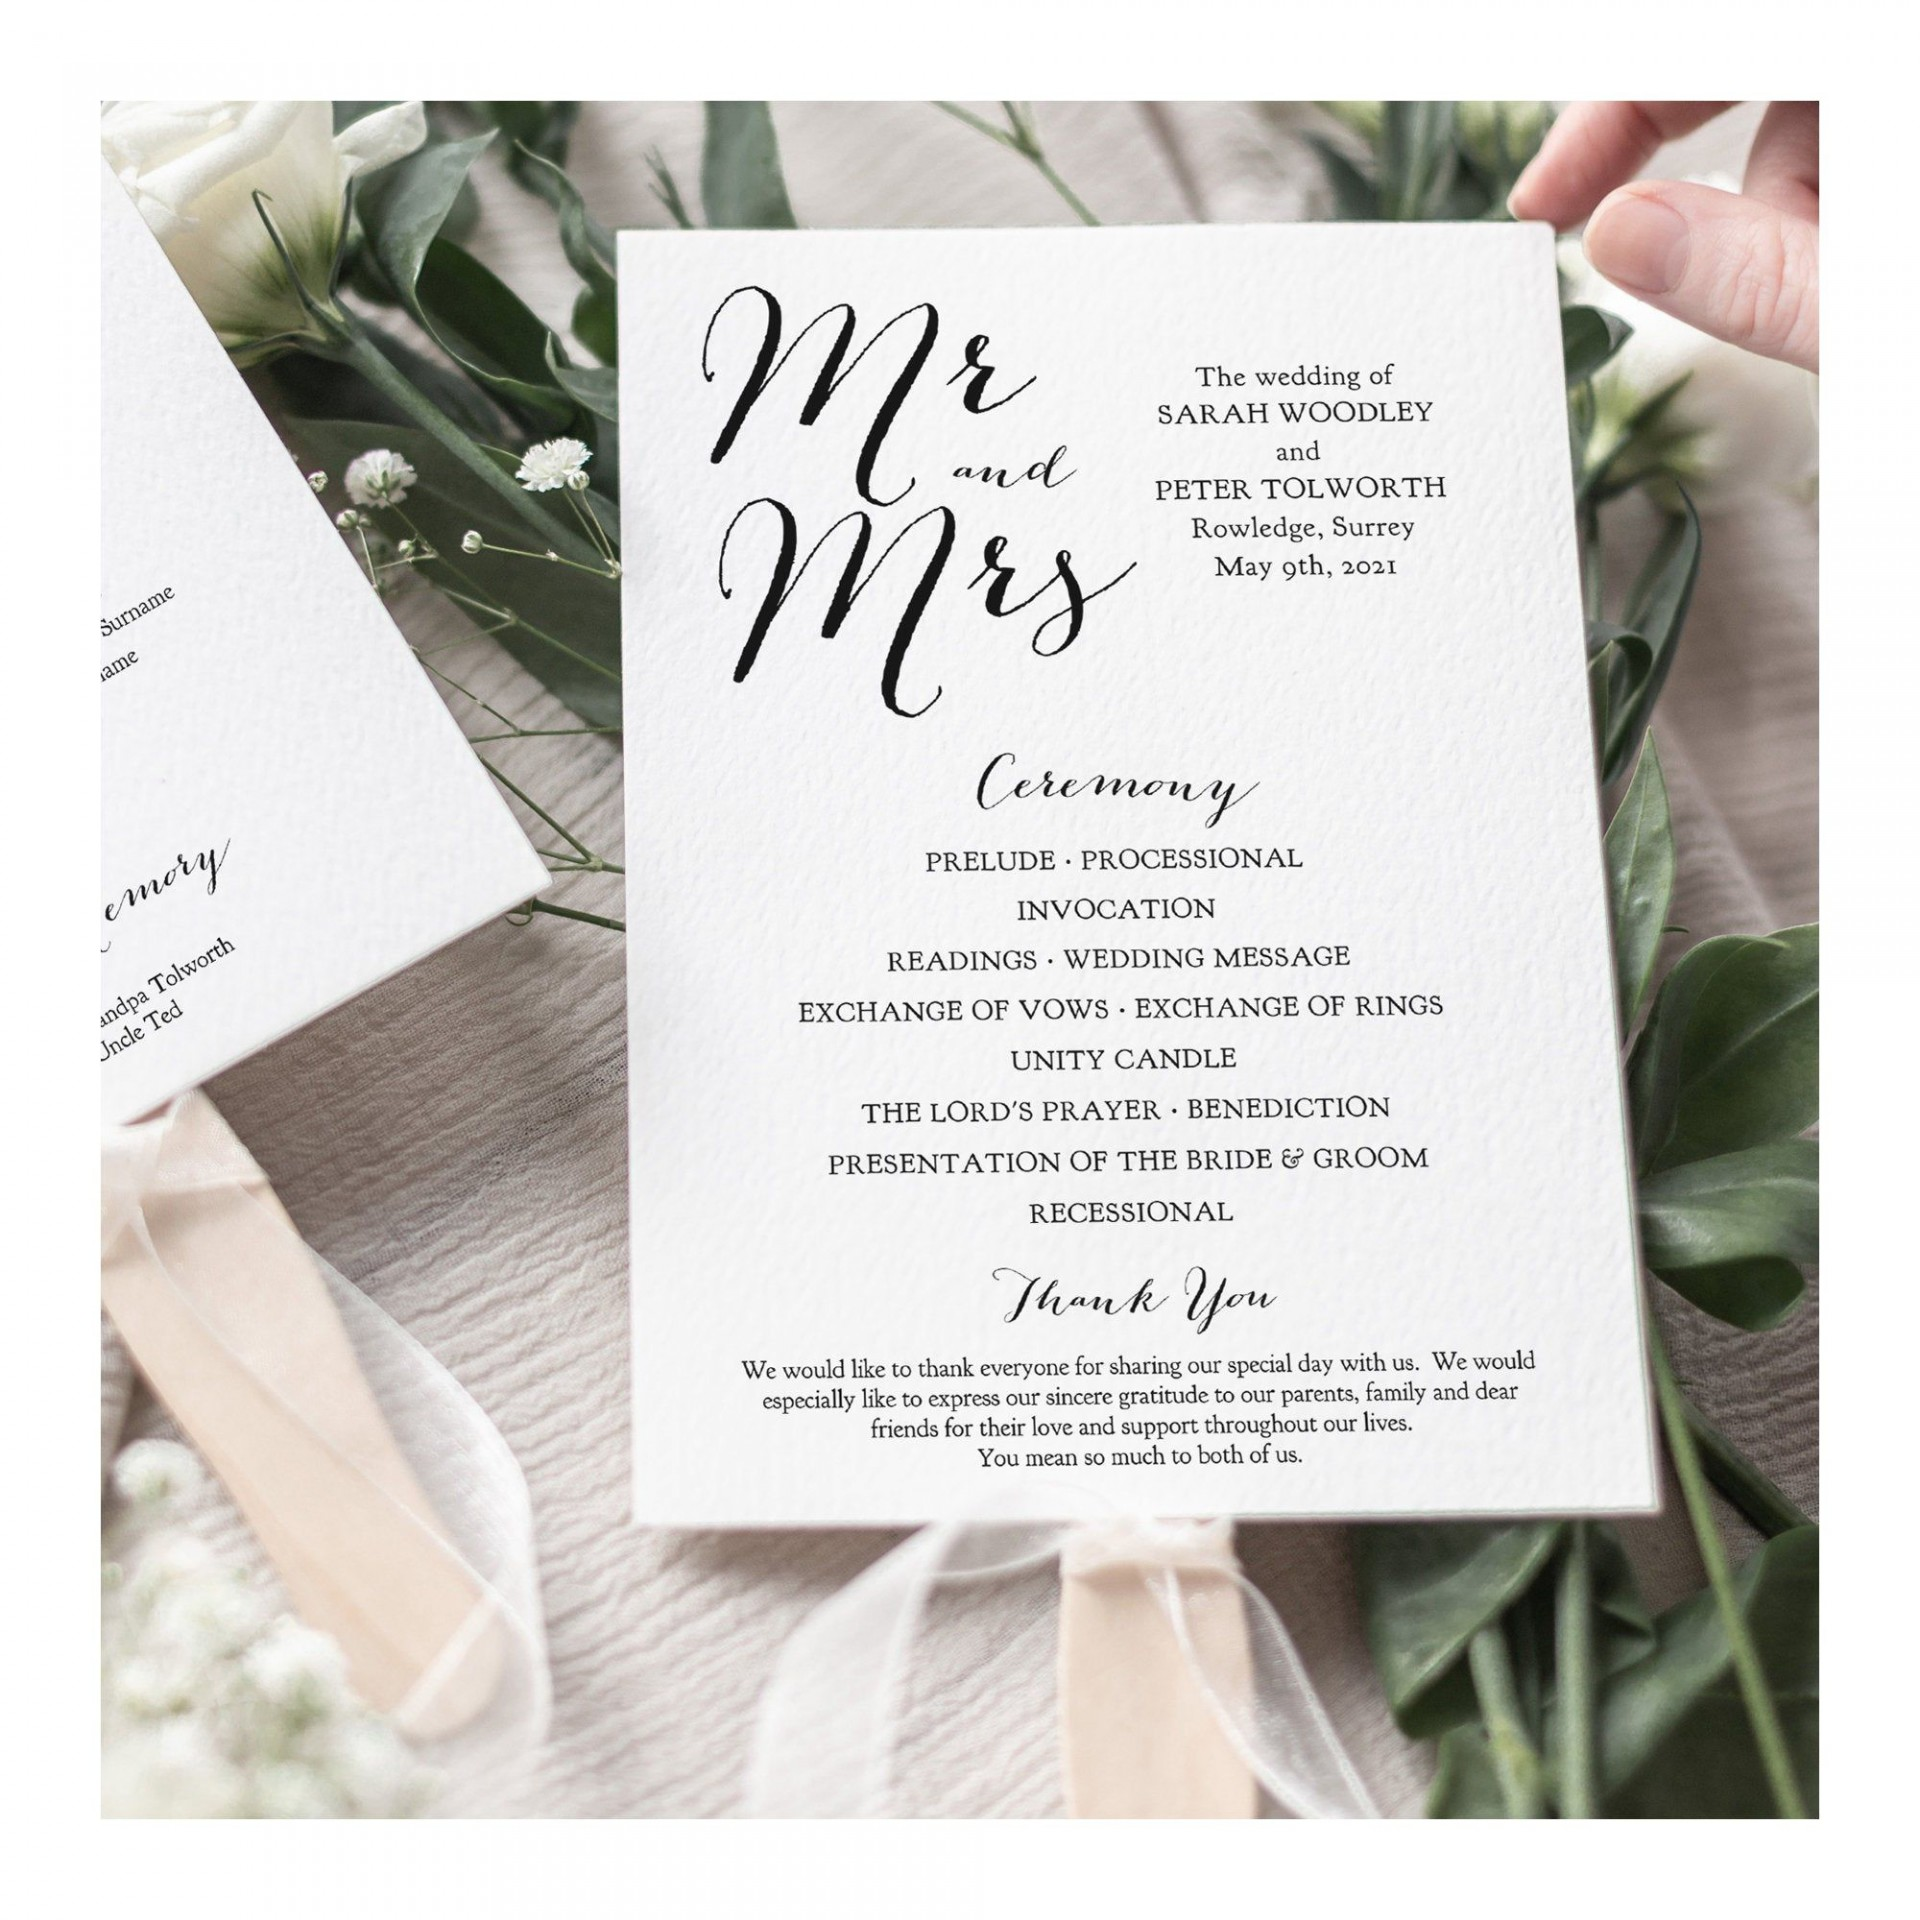 007 Marvelou Wedding Program Template Free Download Photo  Downloadable Pdf Reception Microsoft Word Fan1920